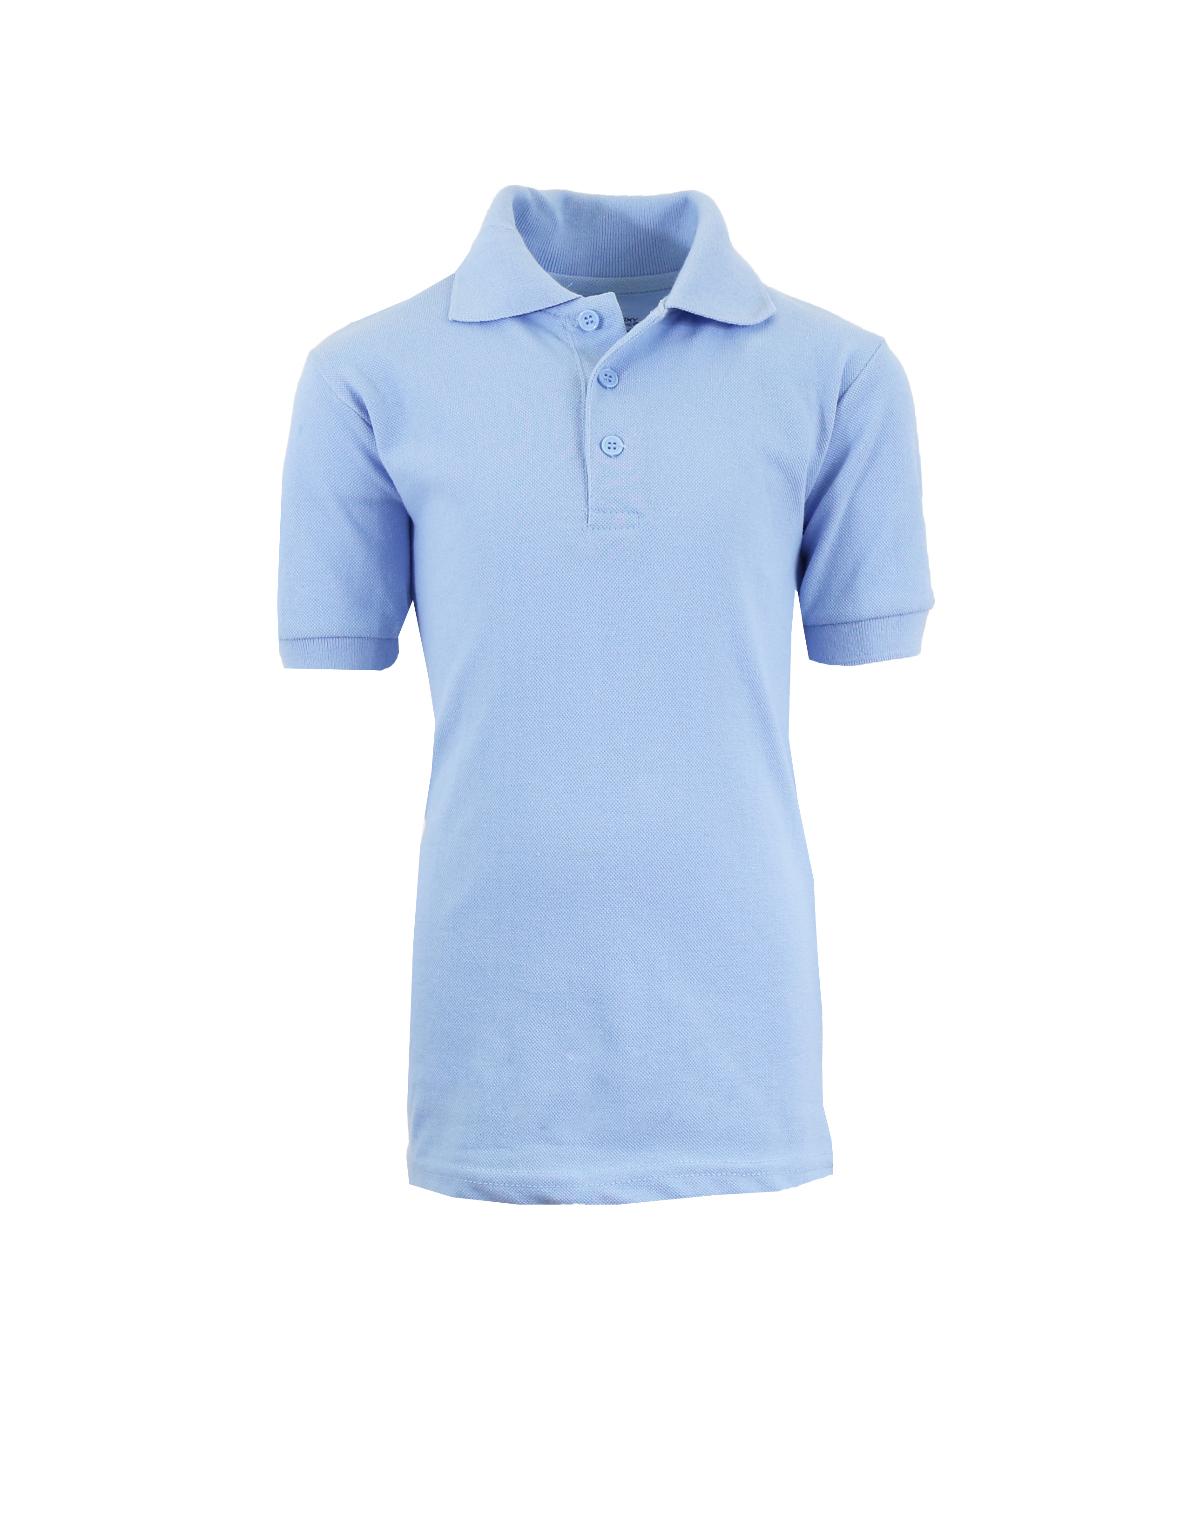 ba196fc0 Wholesale Adult School Light Blue Uniform Short Sleeve Polo Shirts ...